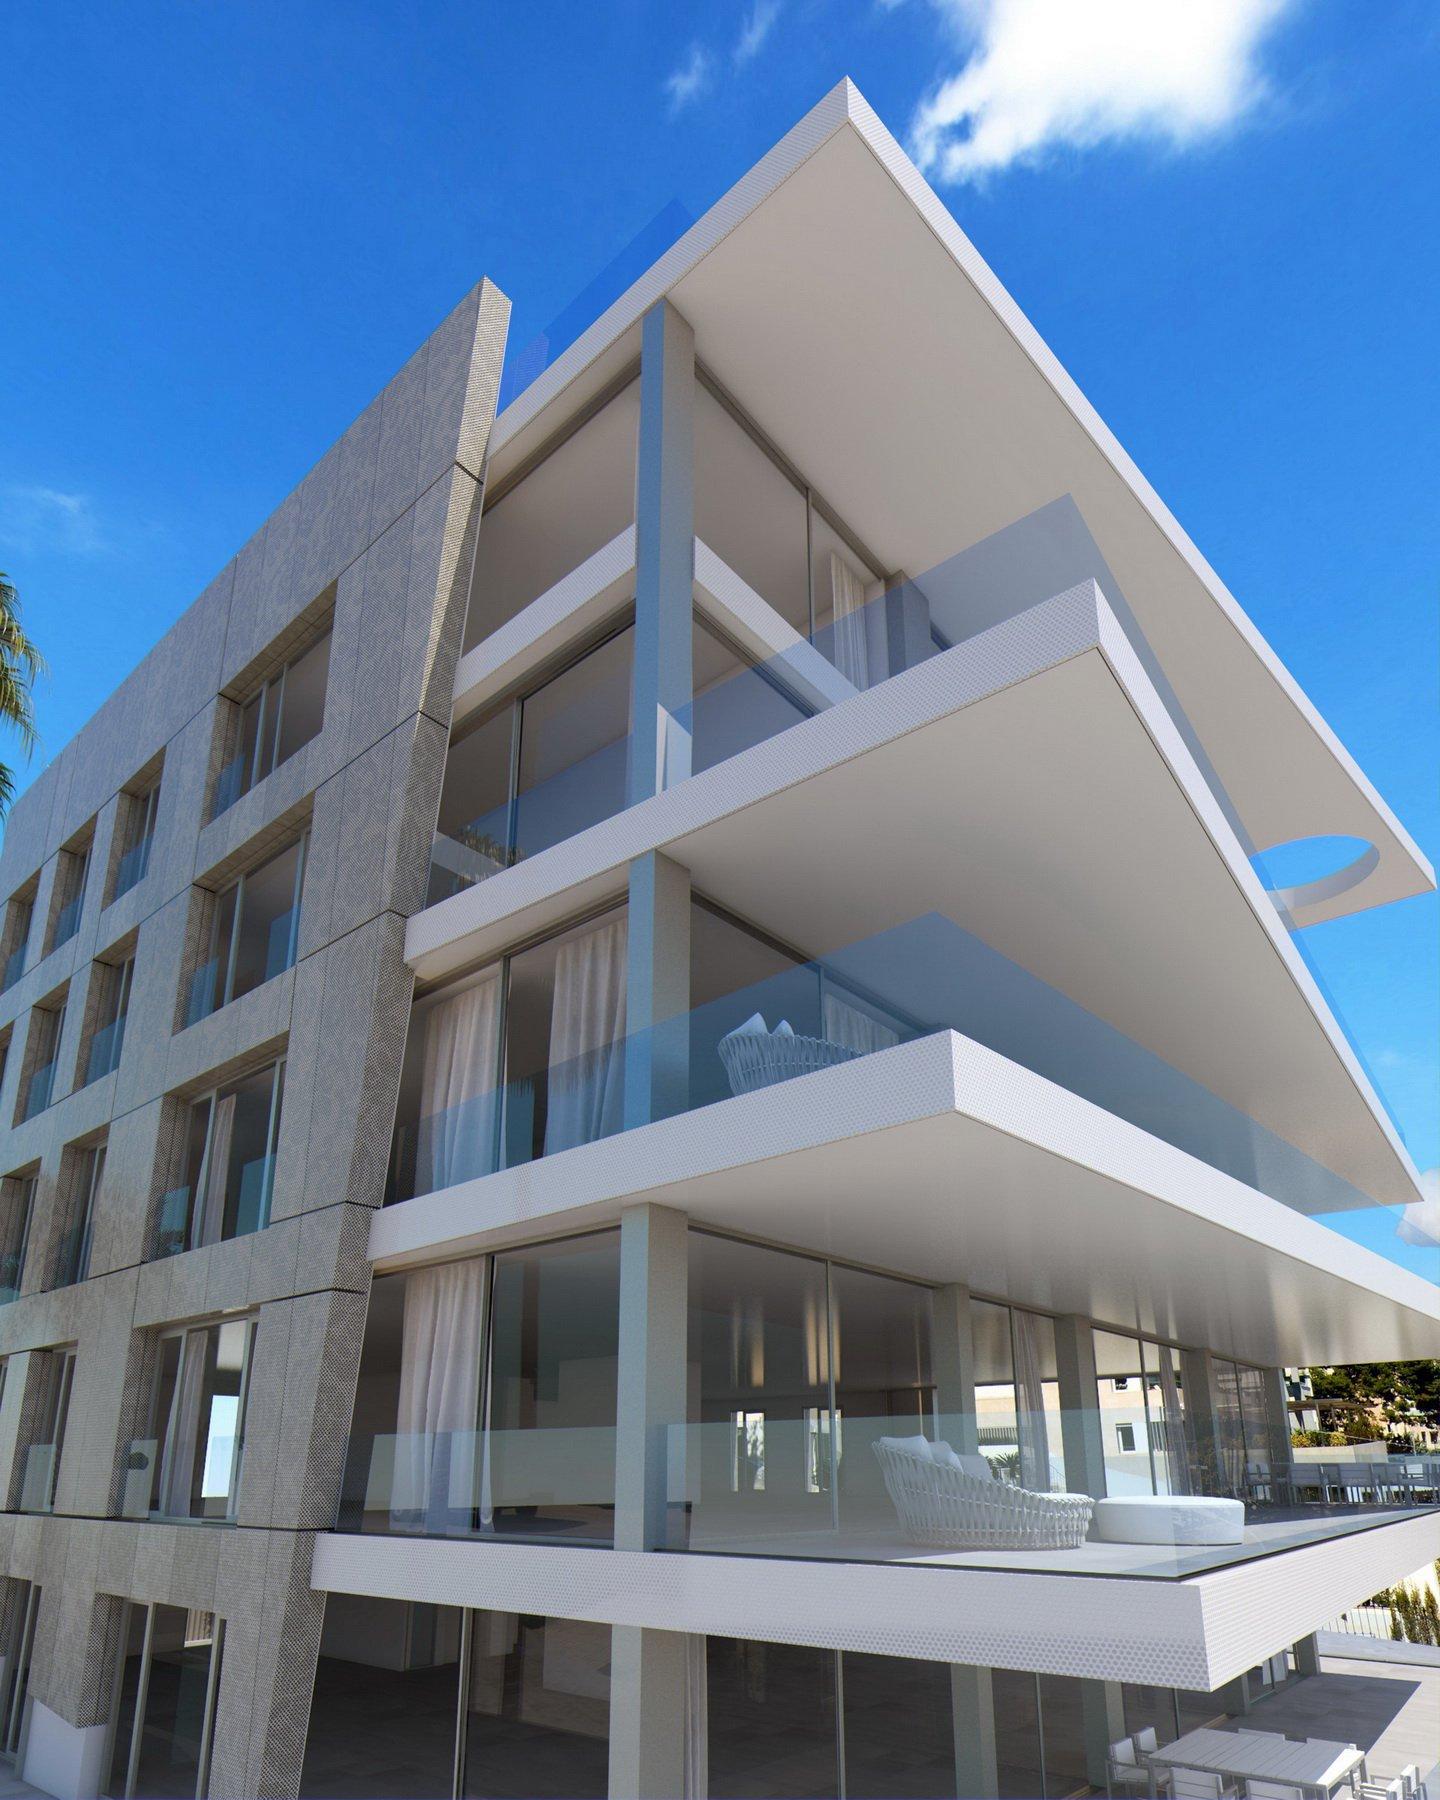 Idlewilde Apartments: Ad Sale Apartment Palma De Mallorca Paseo Maritimo (07001